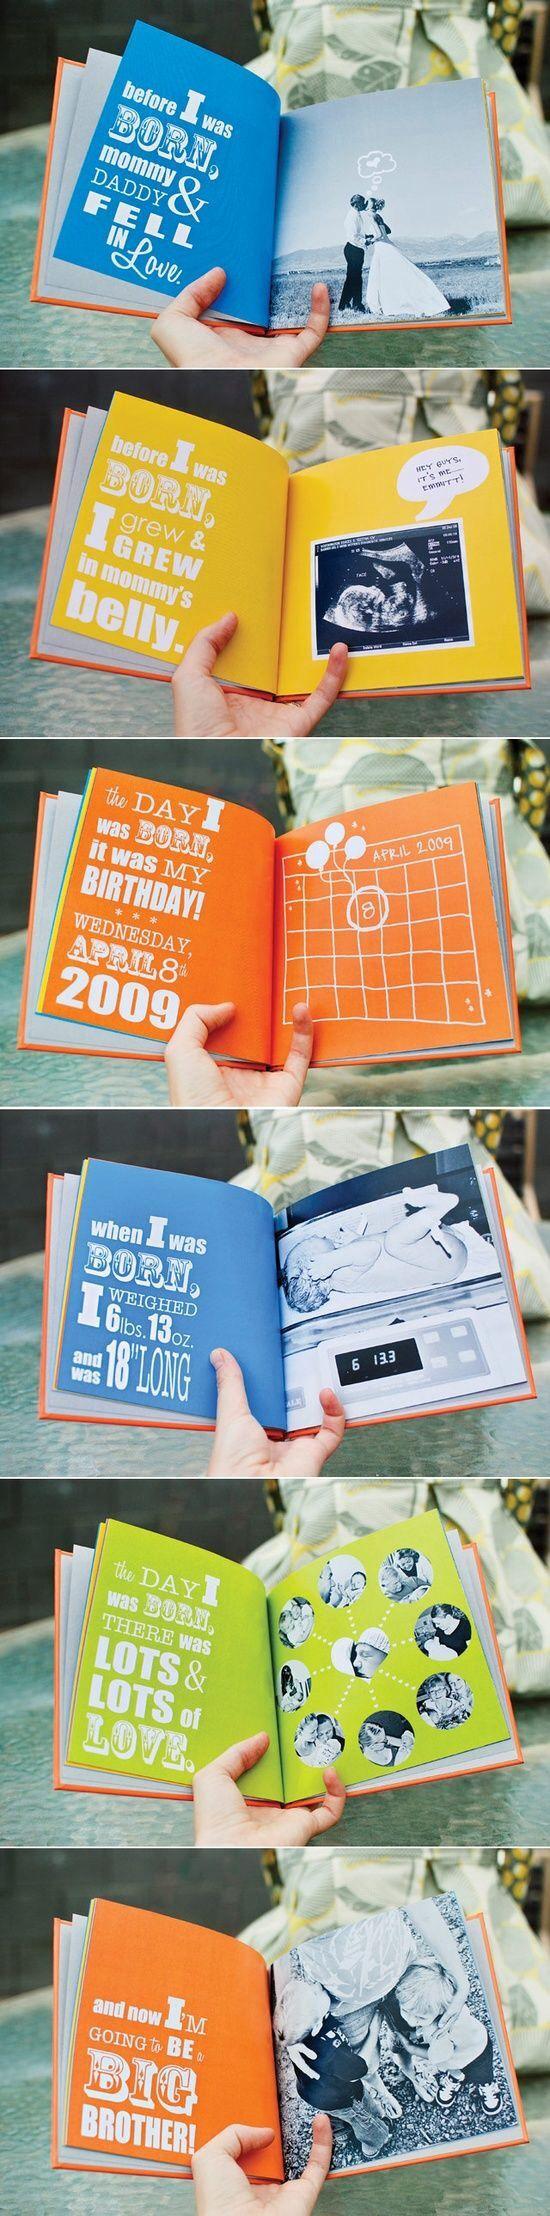 Photo book-Diana assignment